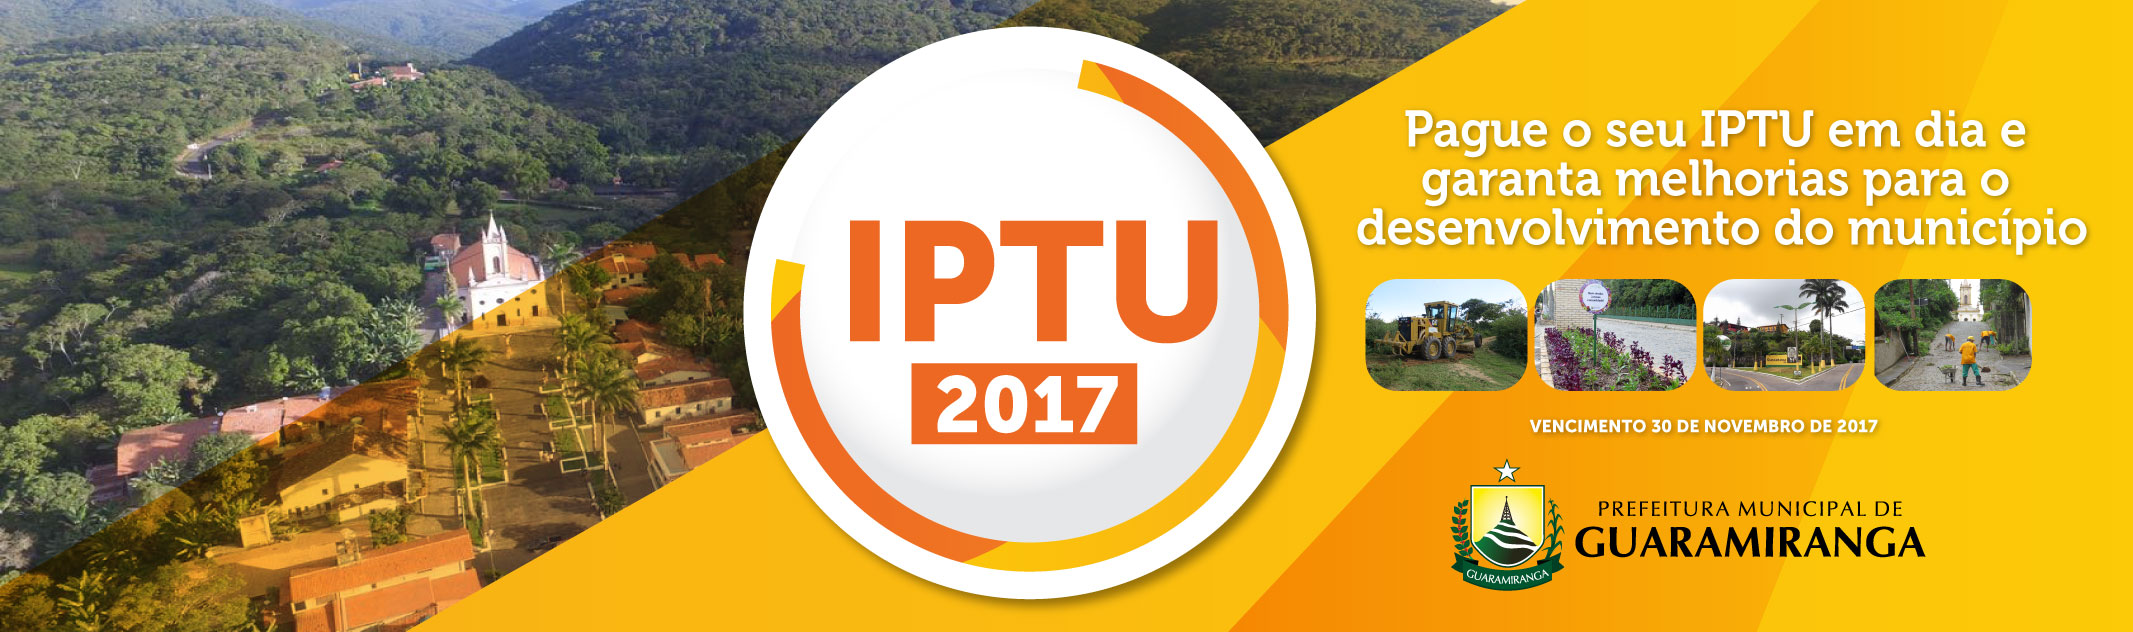 ÚLTIMA SEMANA: IPTU 2017